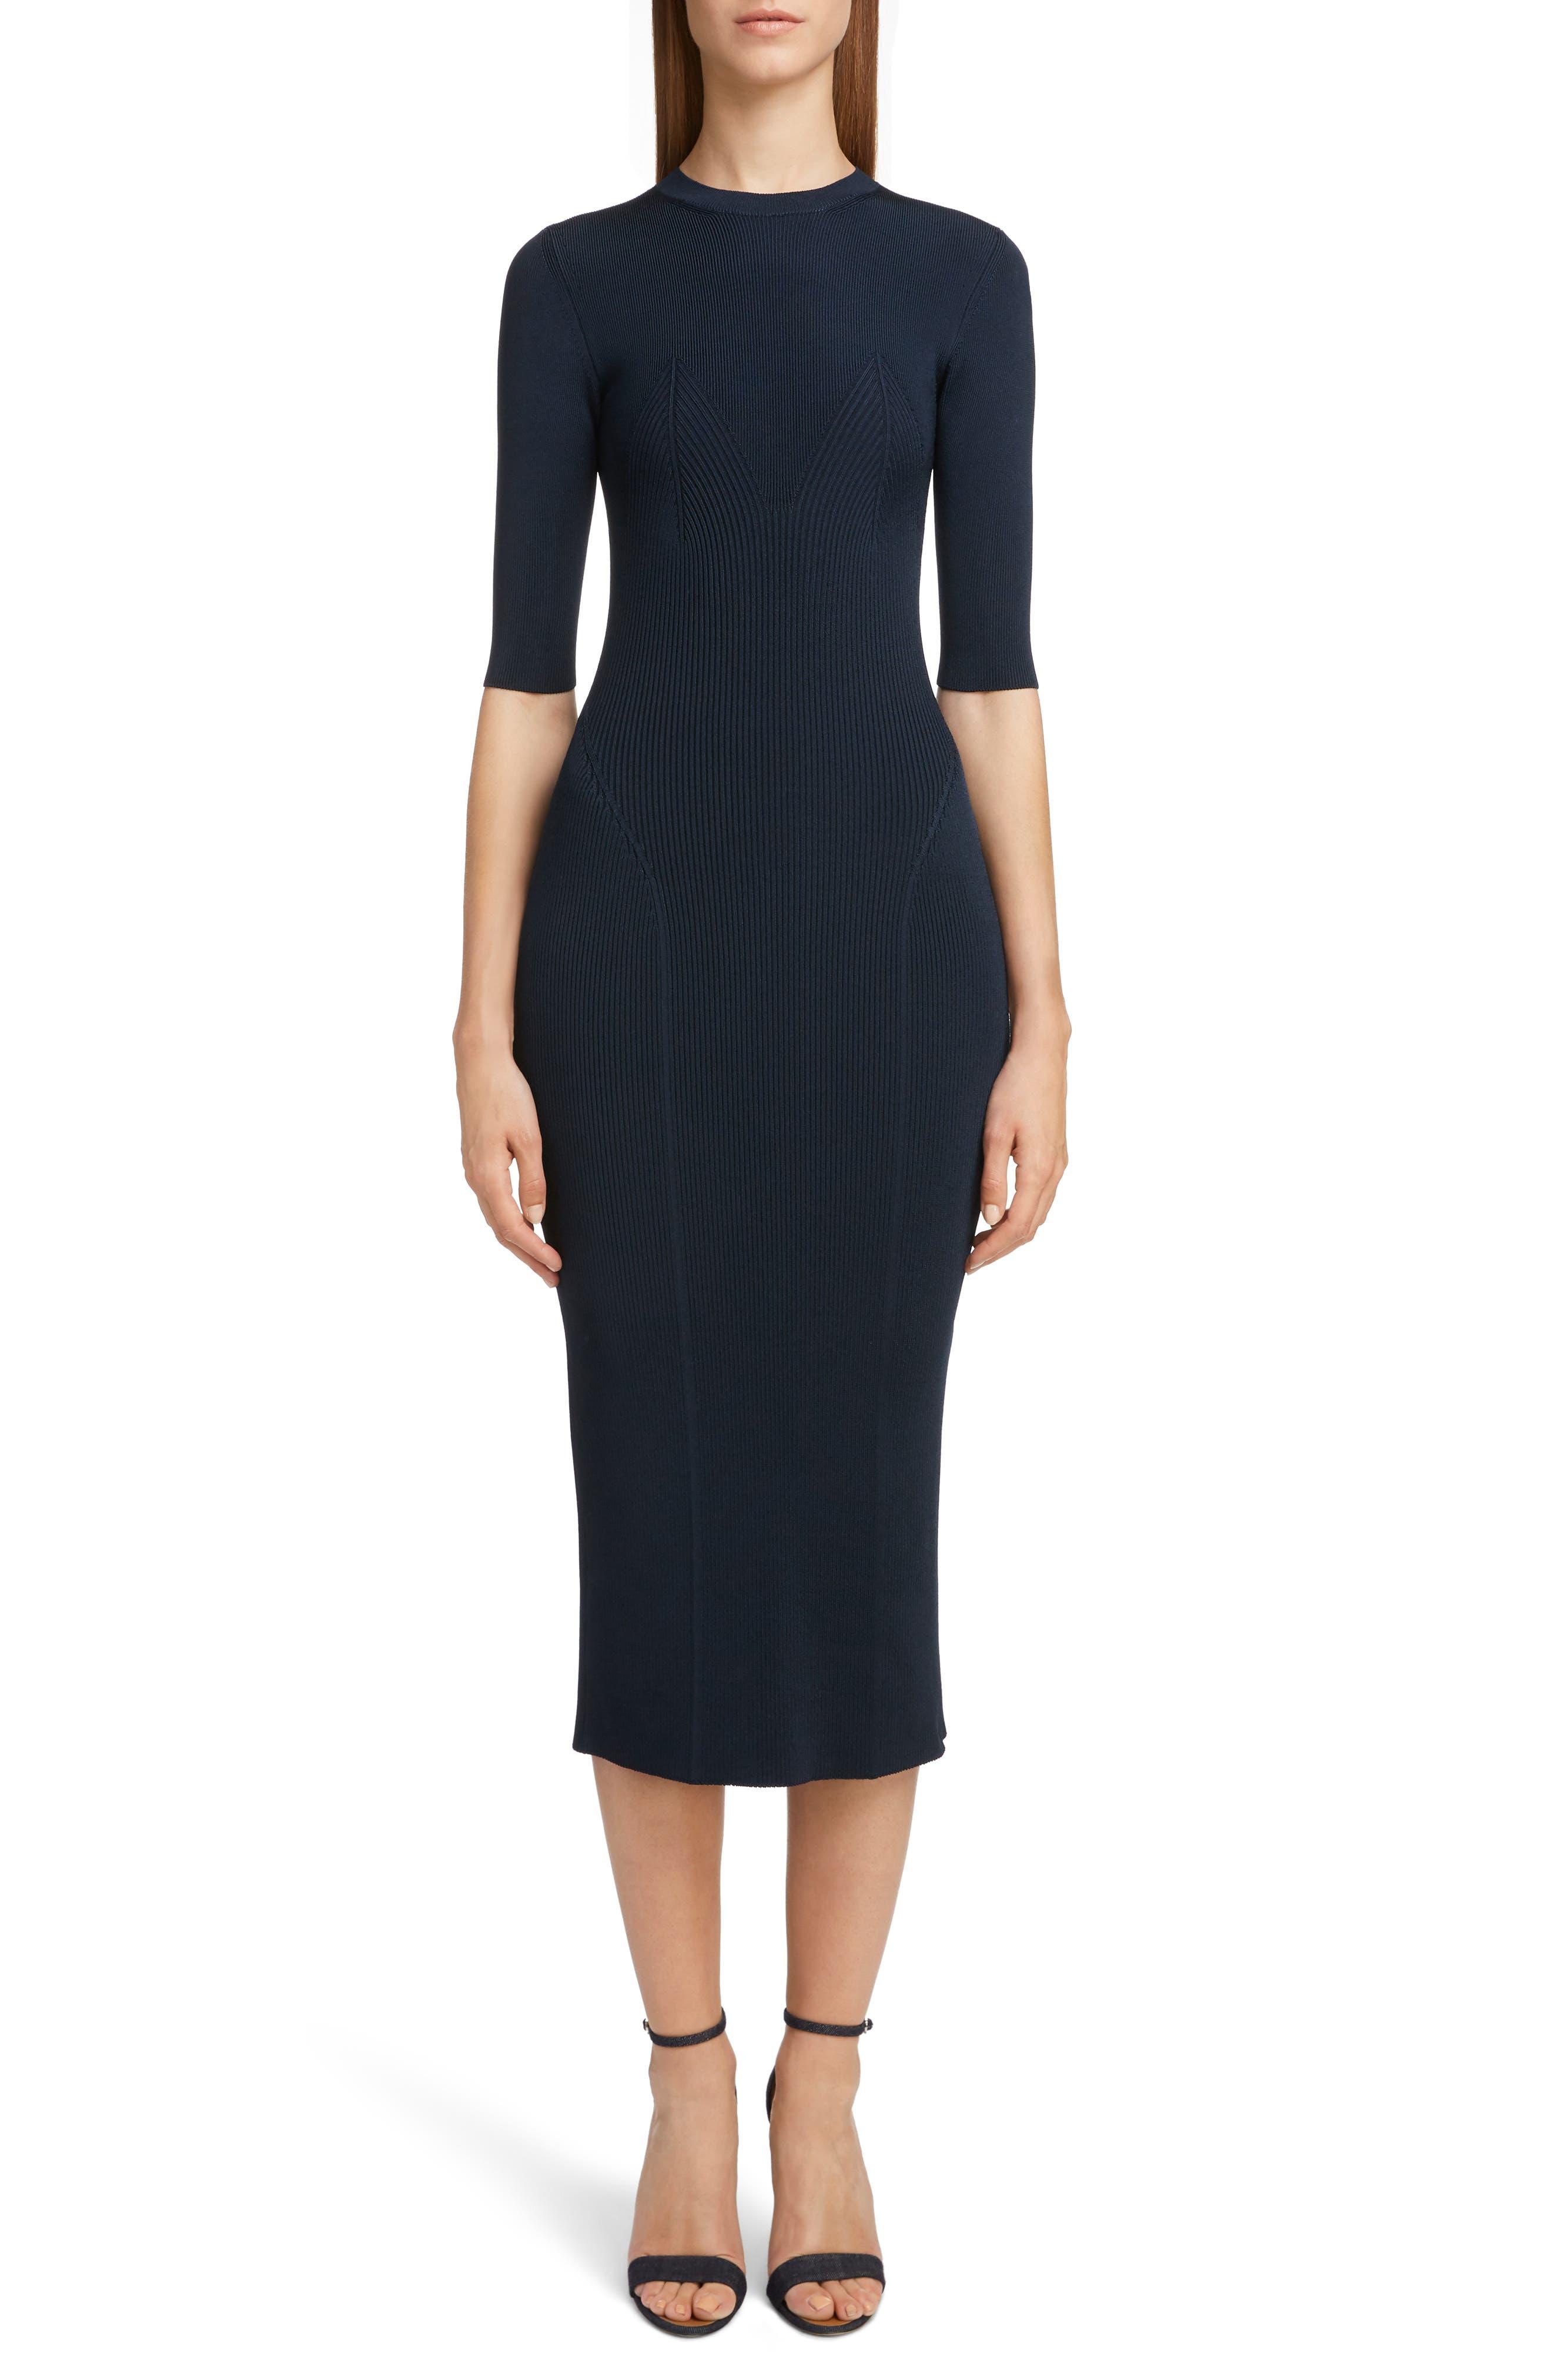 VICTORIA BECKHAM Rib Knit Dress, Main, color, NAVY